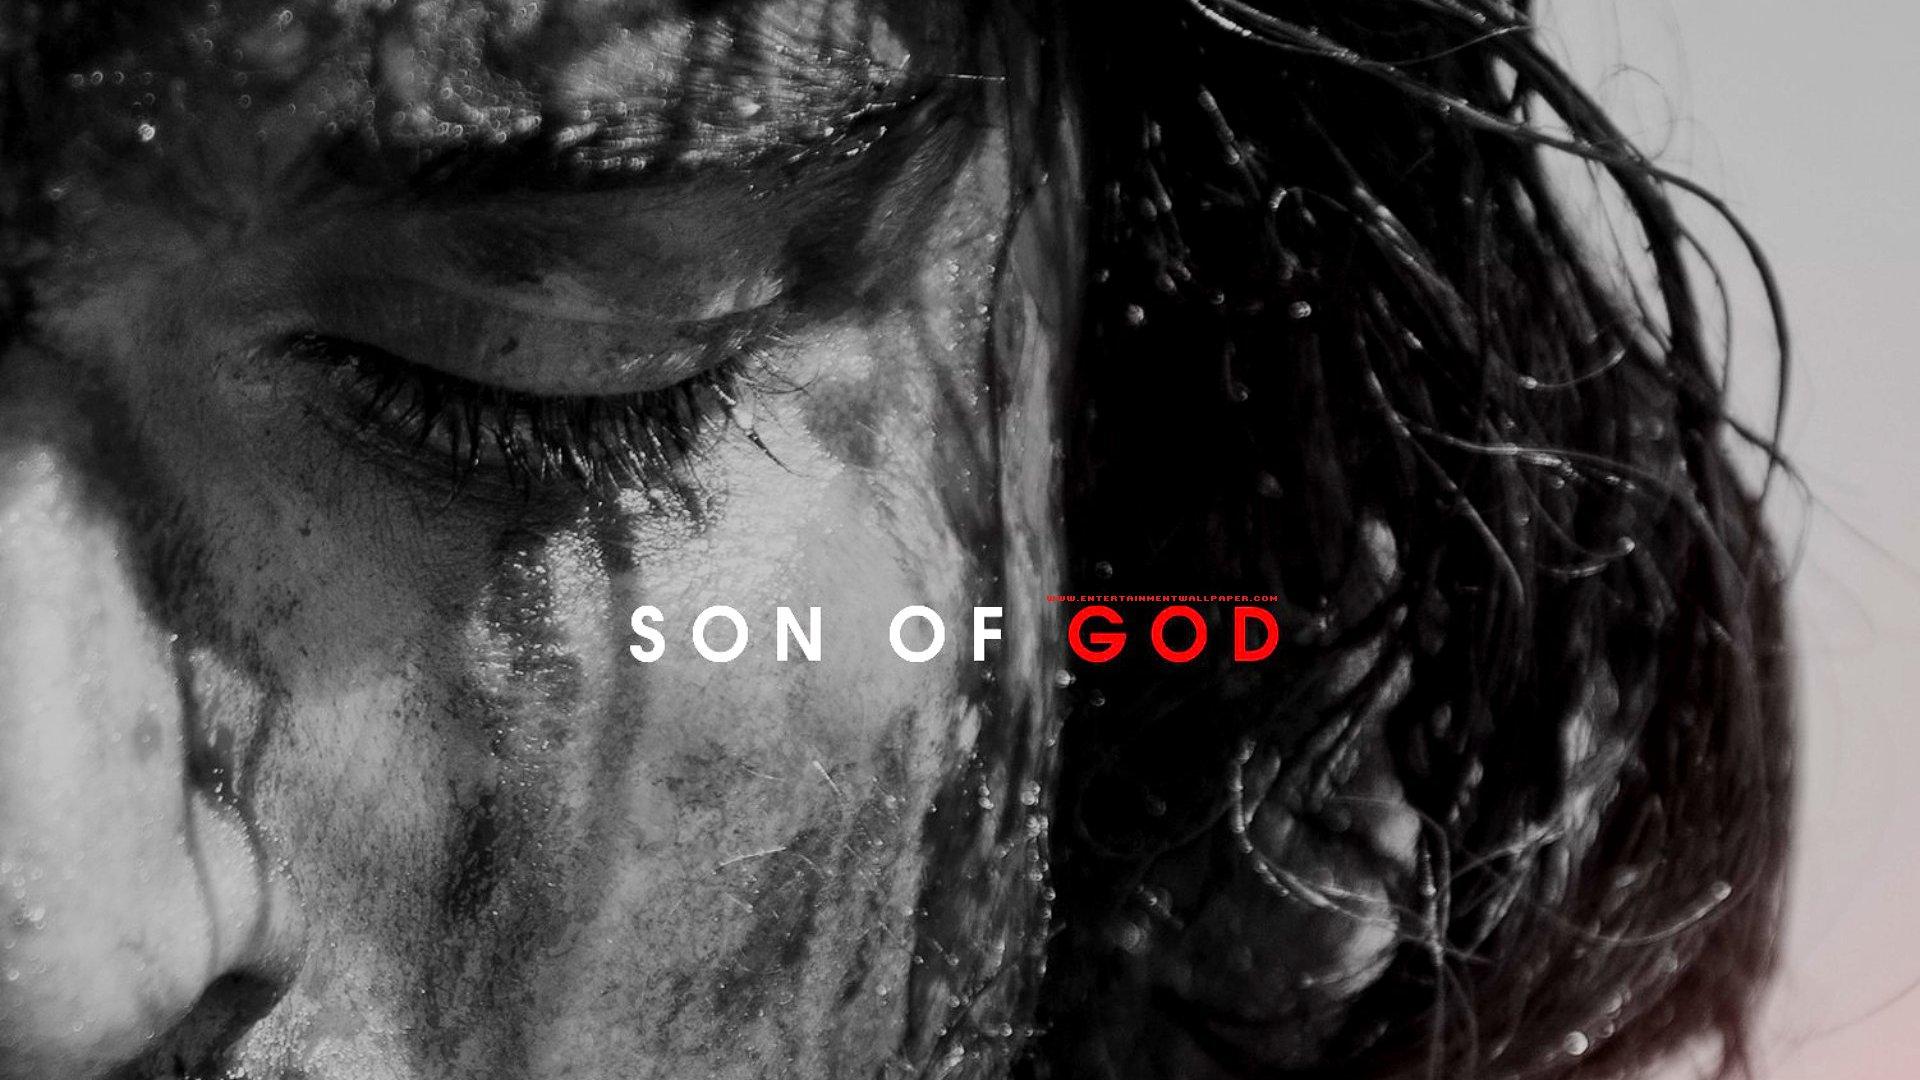 son of god 2014 movie wallpaper 5321dbc86585d Moustache Magazine 1920x1080